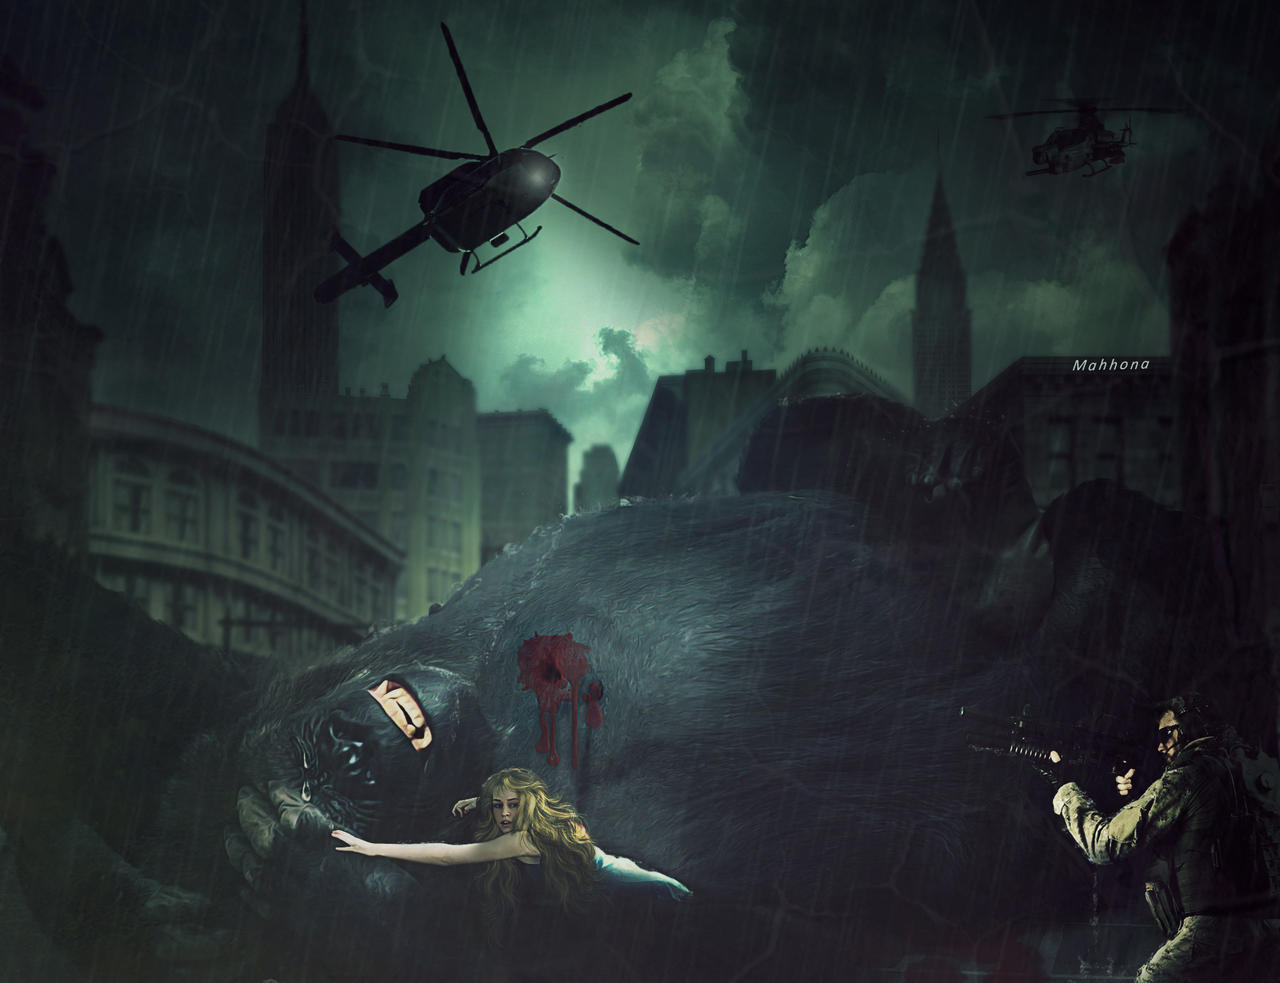 King-Kong's-end by Mahhona